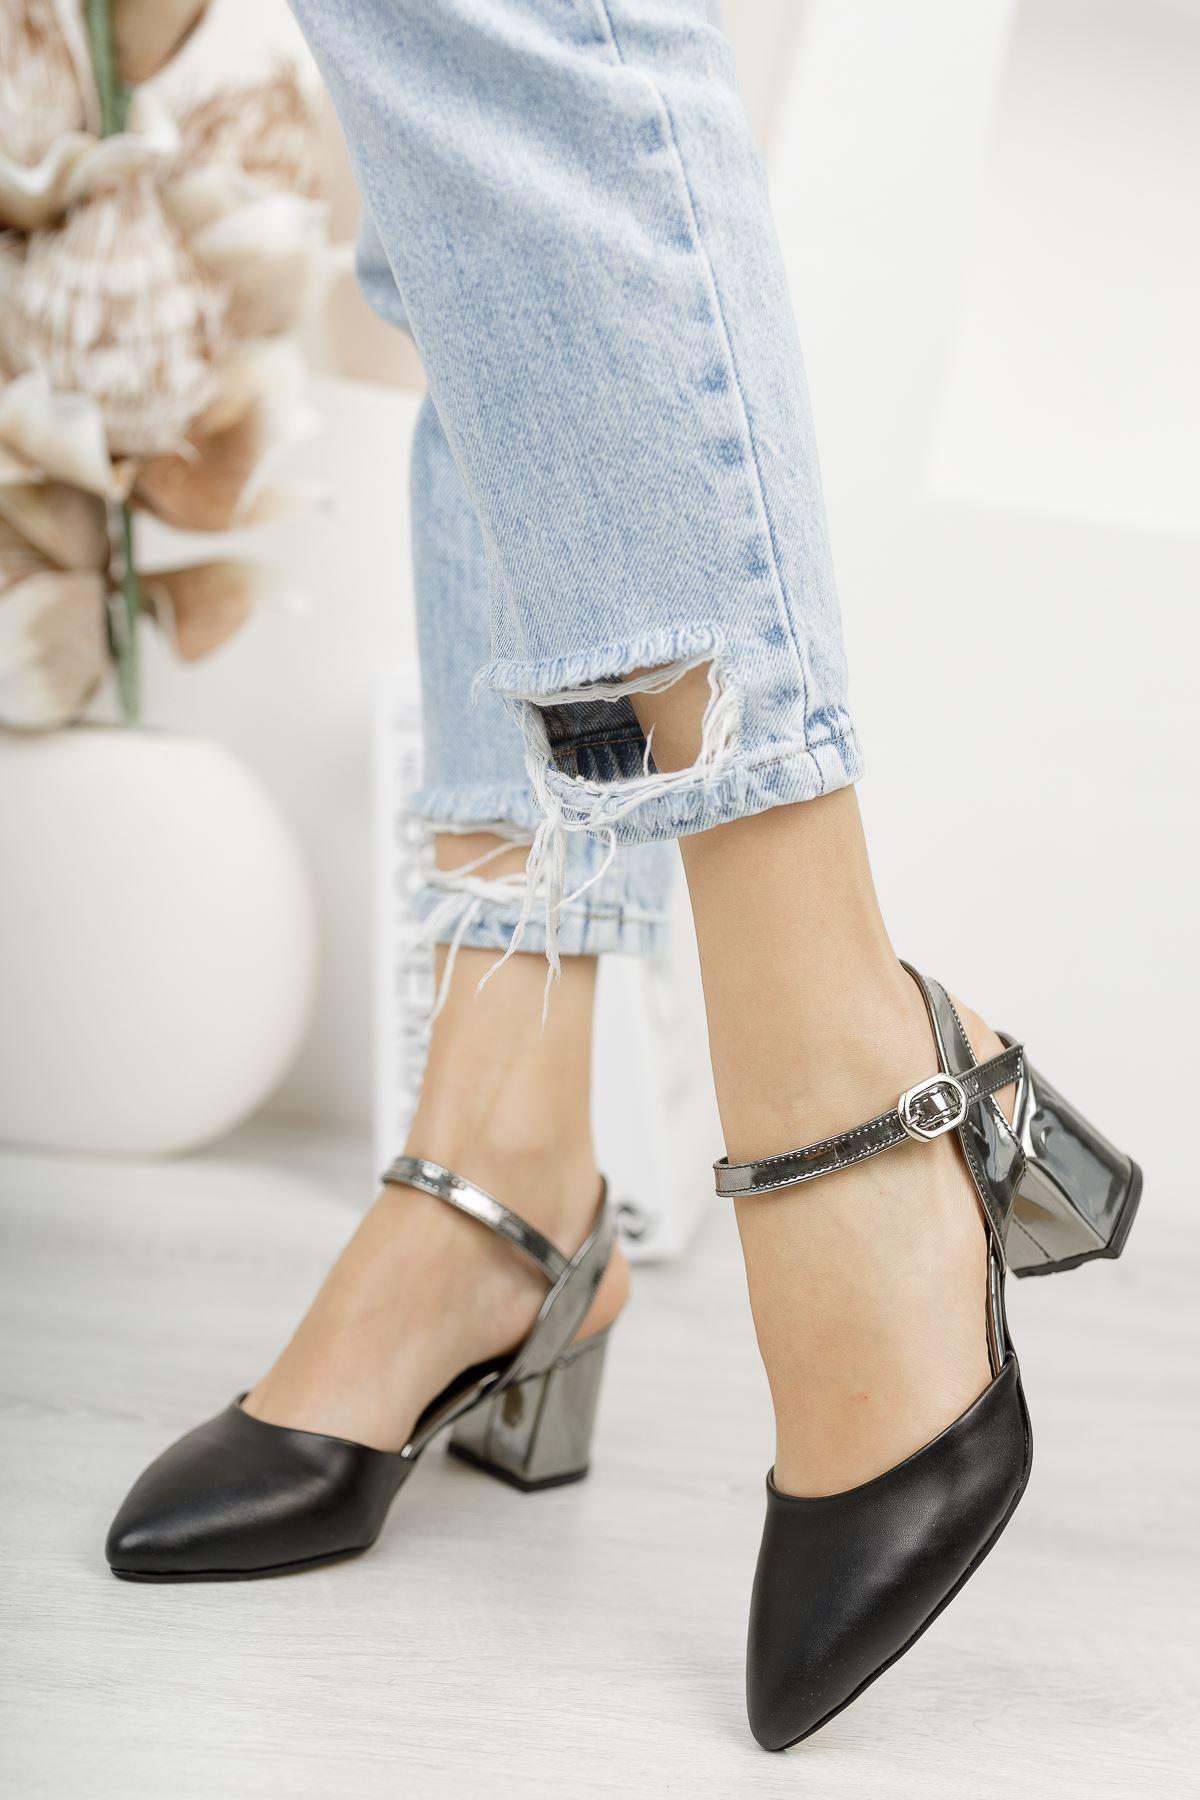 Kadın Vodes Kemer Detaylı Mat Deri Ayna Topuklu Siyah Ayakkabı